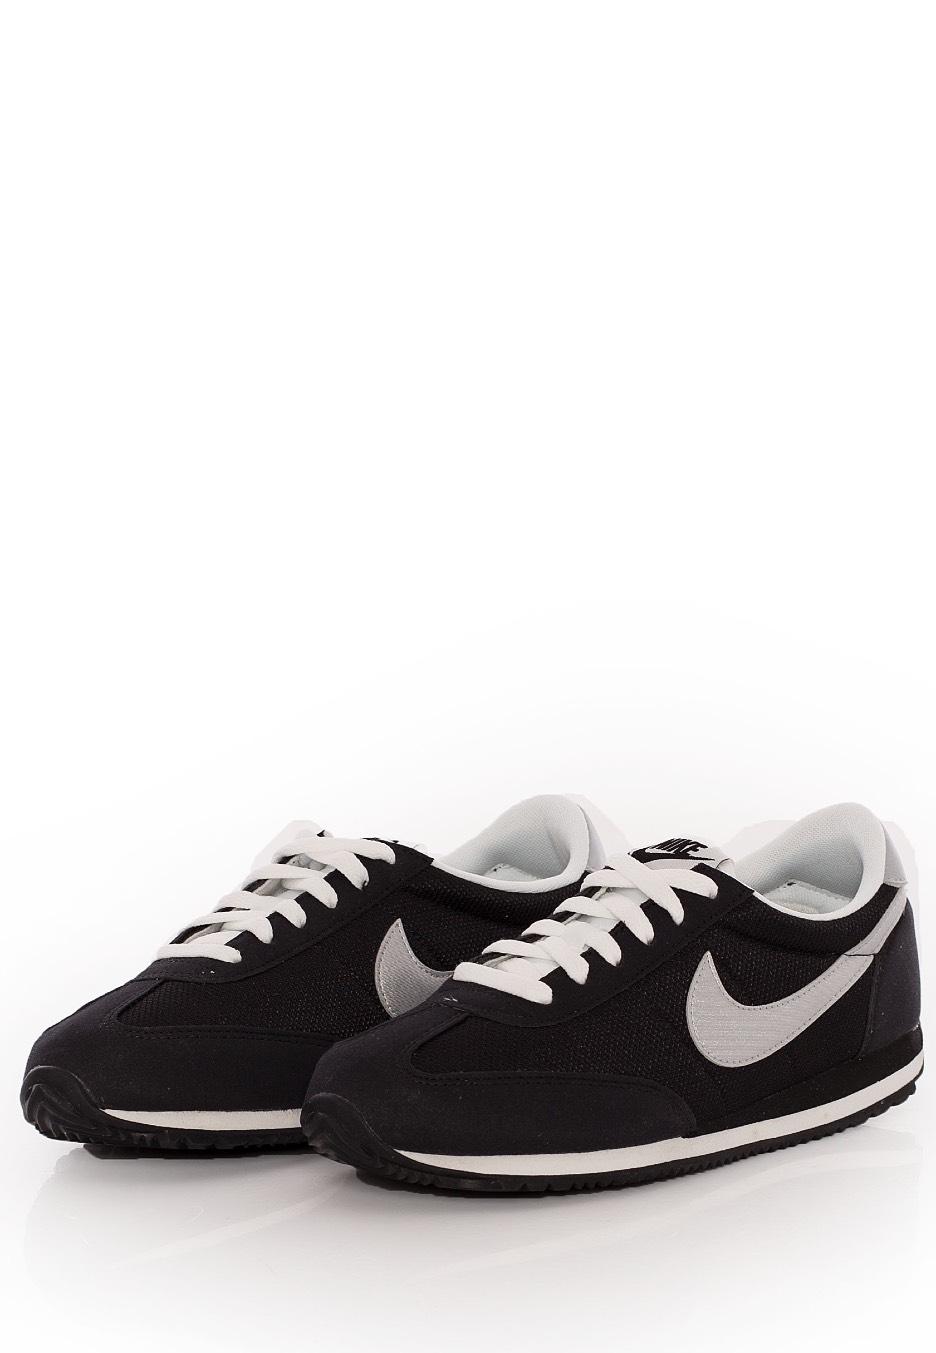 newest 3f271 1f212 Silversummit Shoes Oceania Girl Nike Blackmetallic White OqB